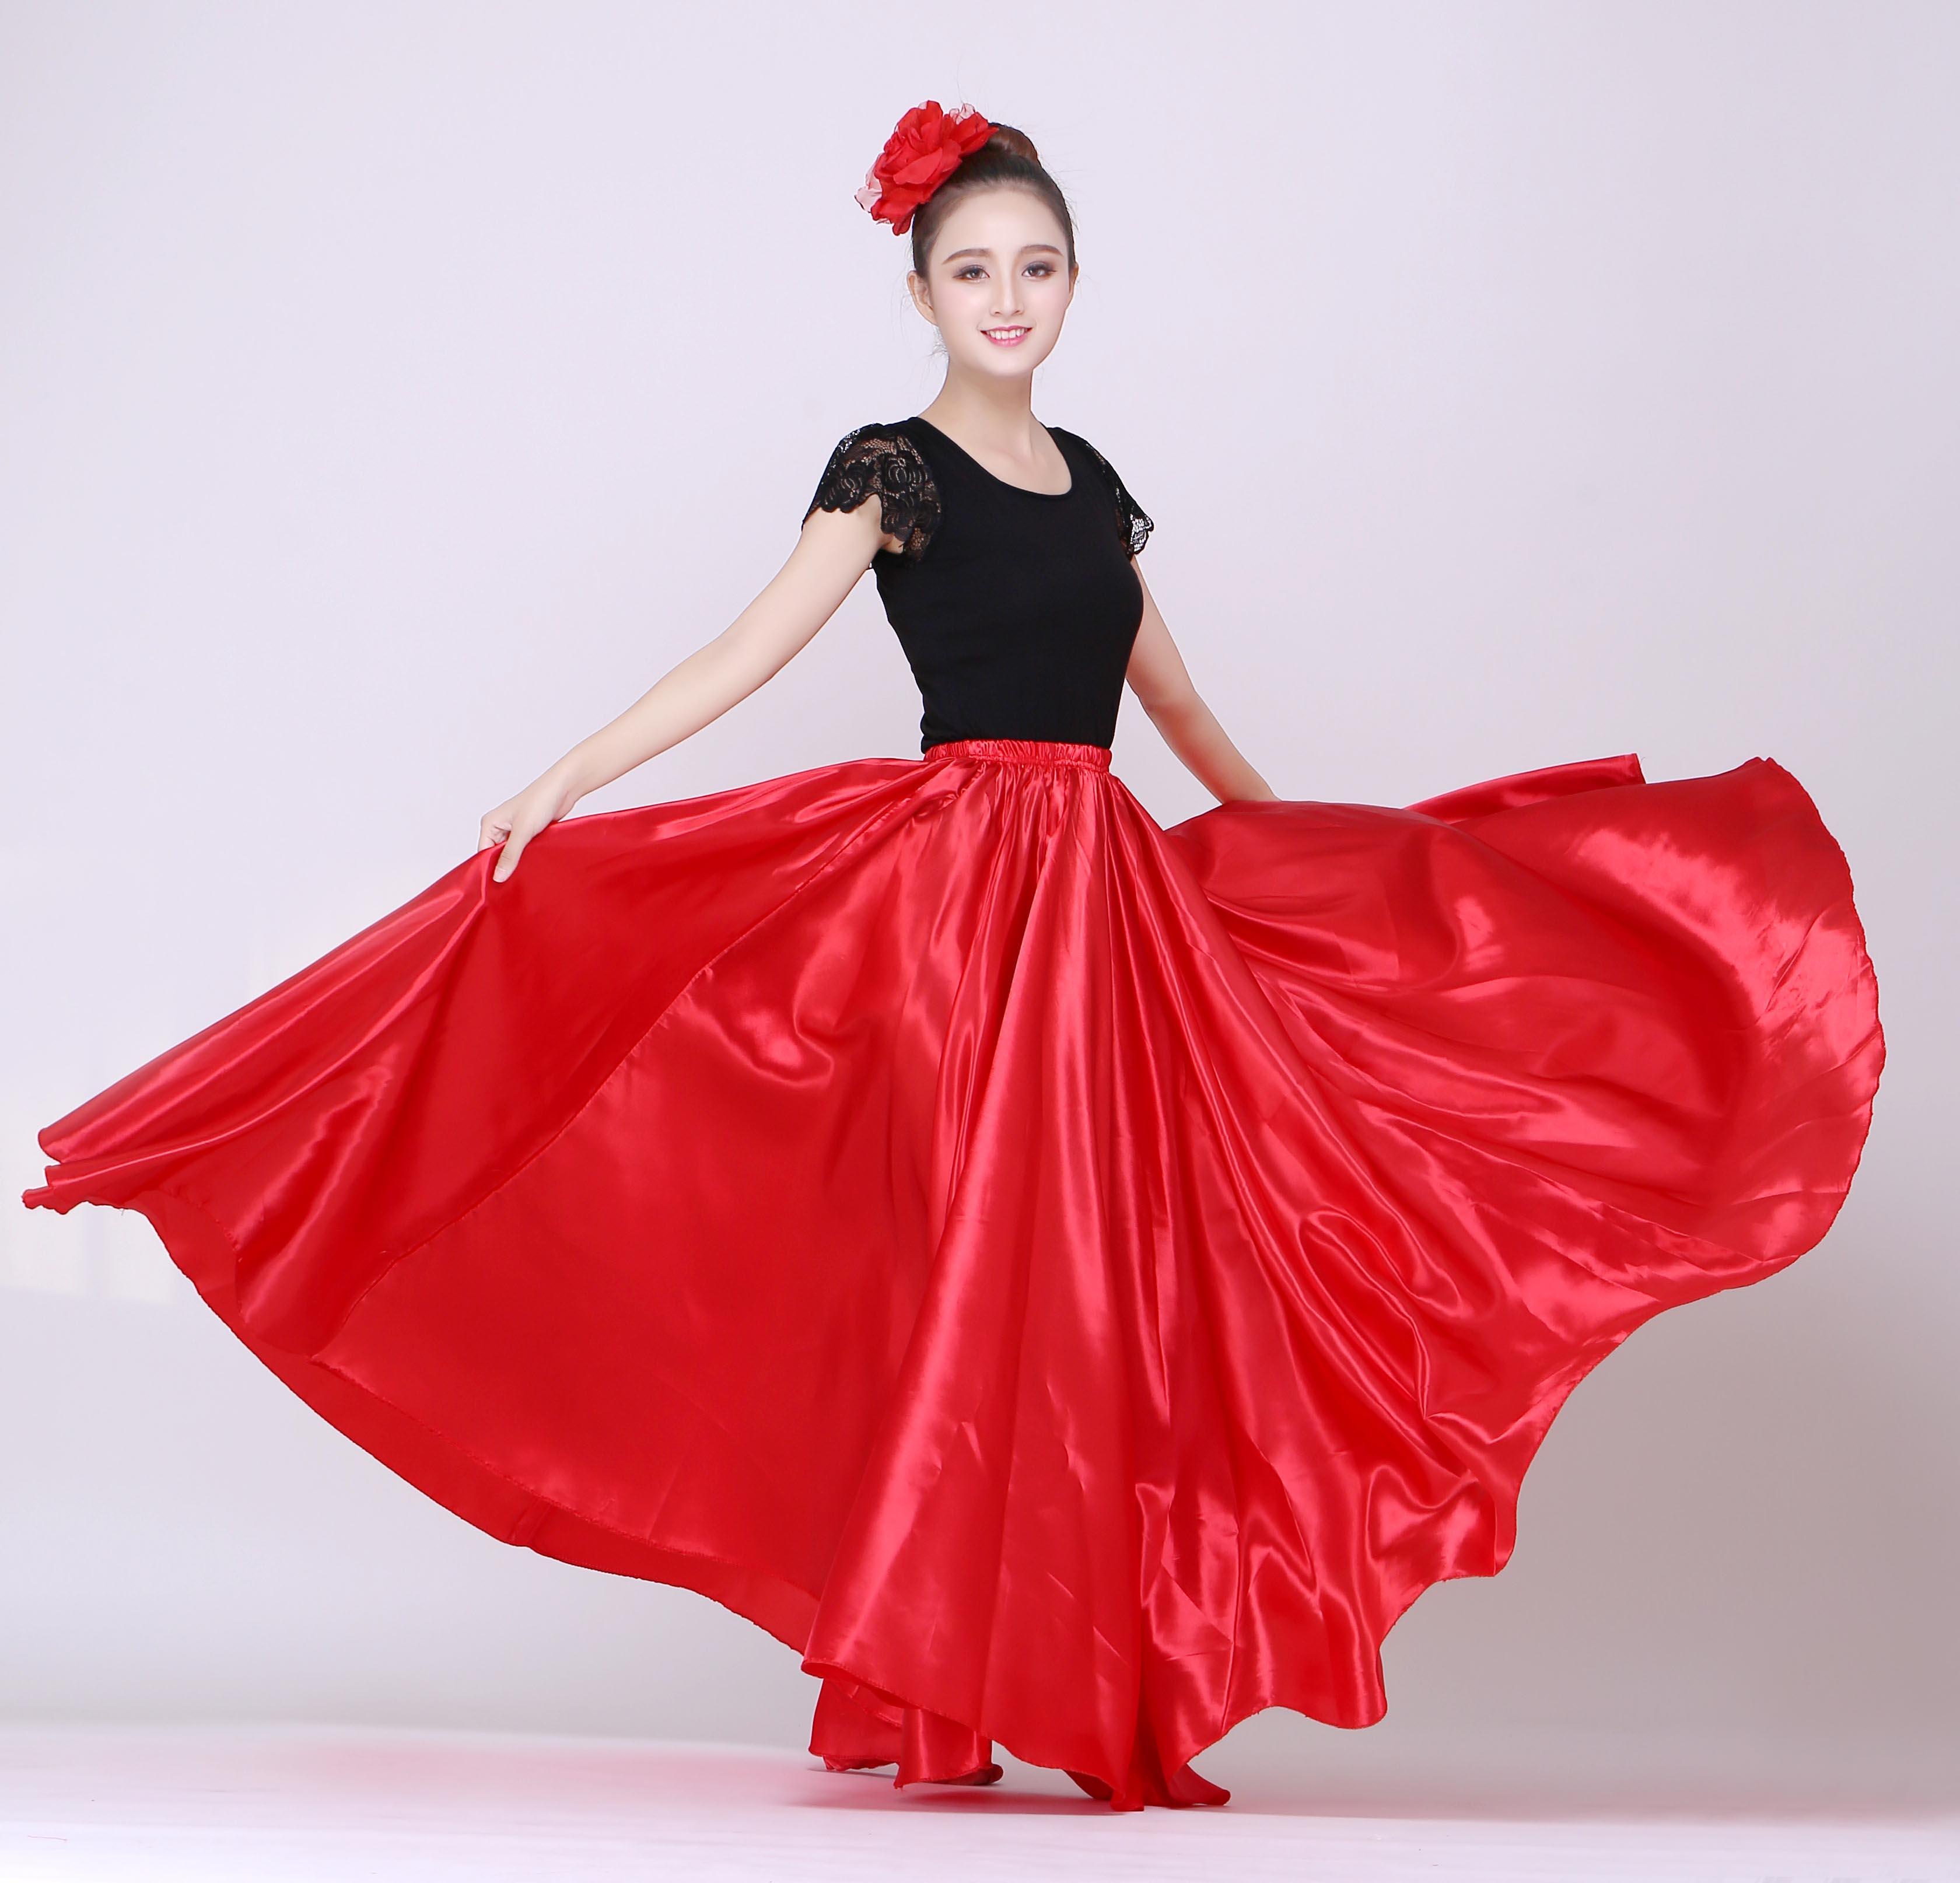 Spanish Stage Wear Dance Performance Flamenco Long Skirt Style Women Costumes Satin High Quality Ballroom Dance Dress Skirt